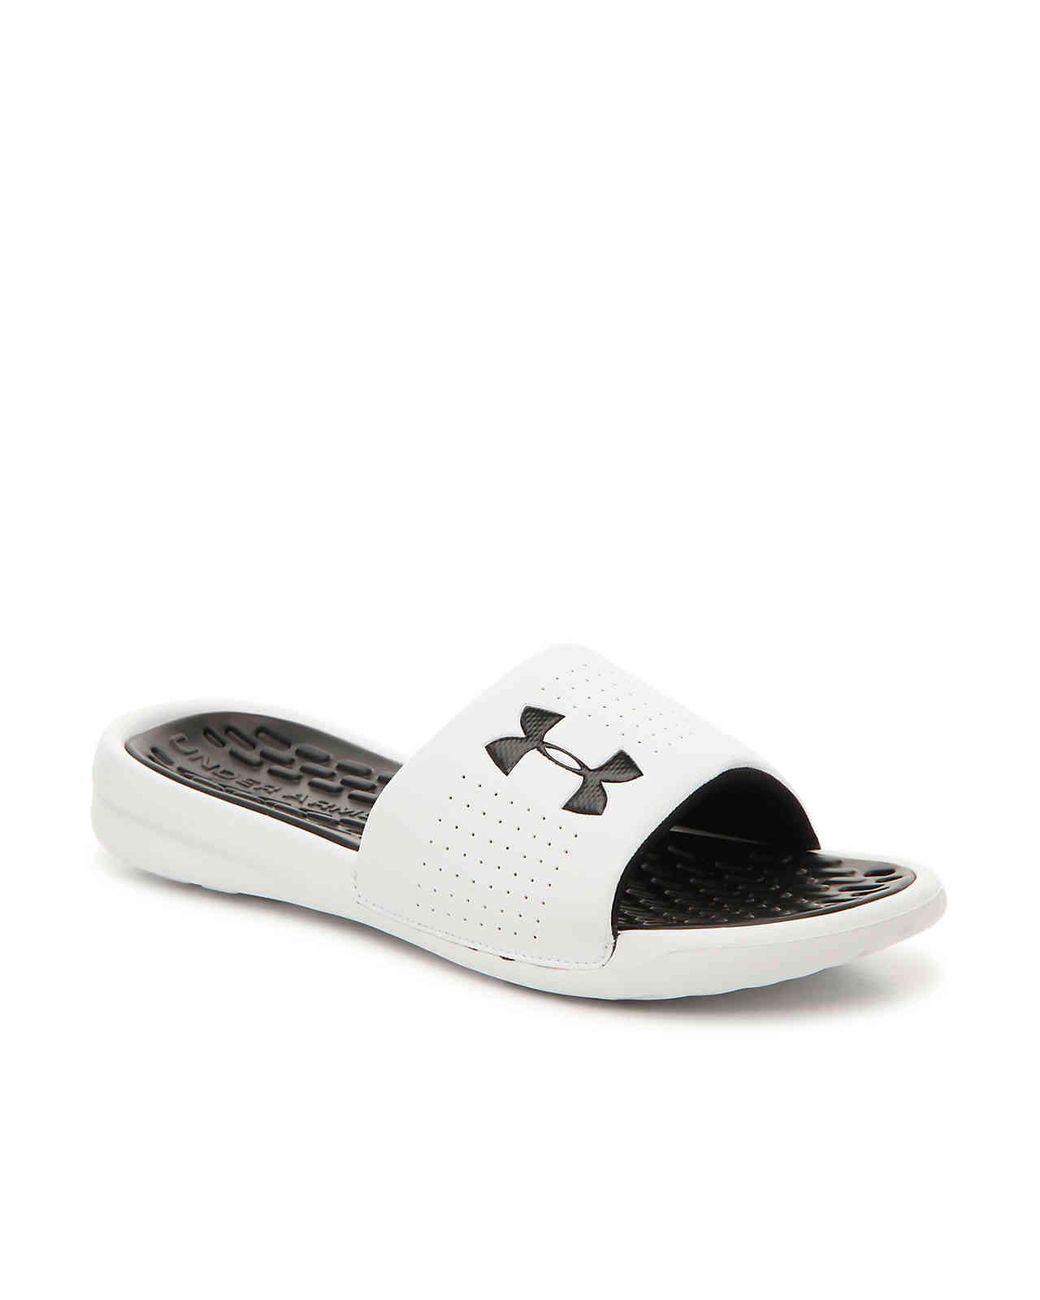 4a258de386a Lyst - Under Armour Playmaker Fix Sl Slide Sandal in White for Men ...